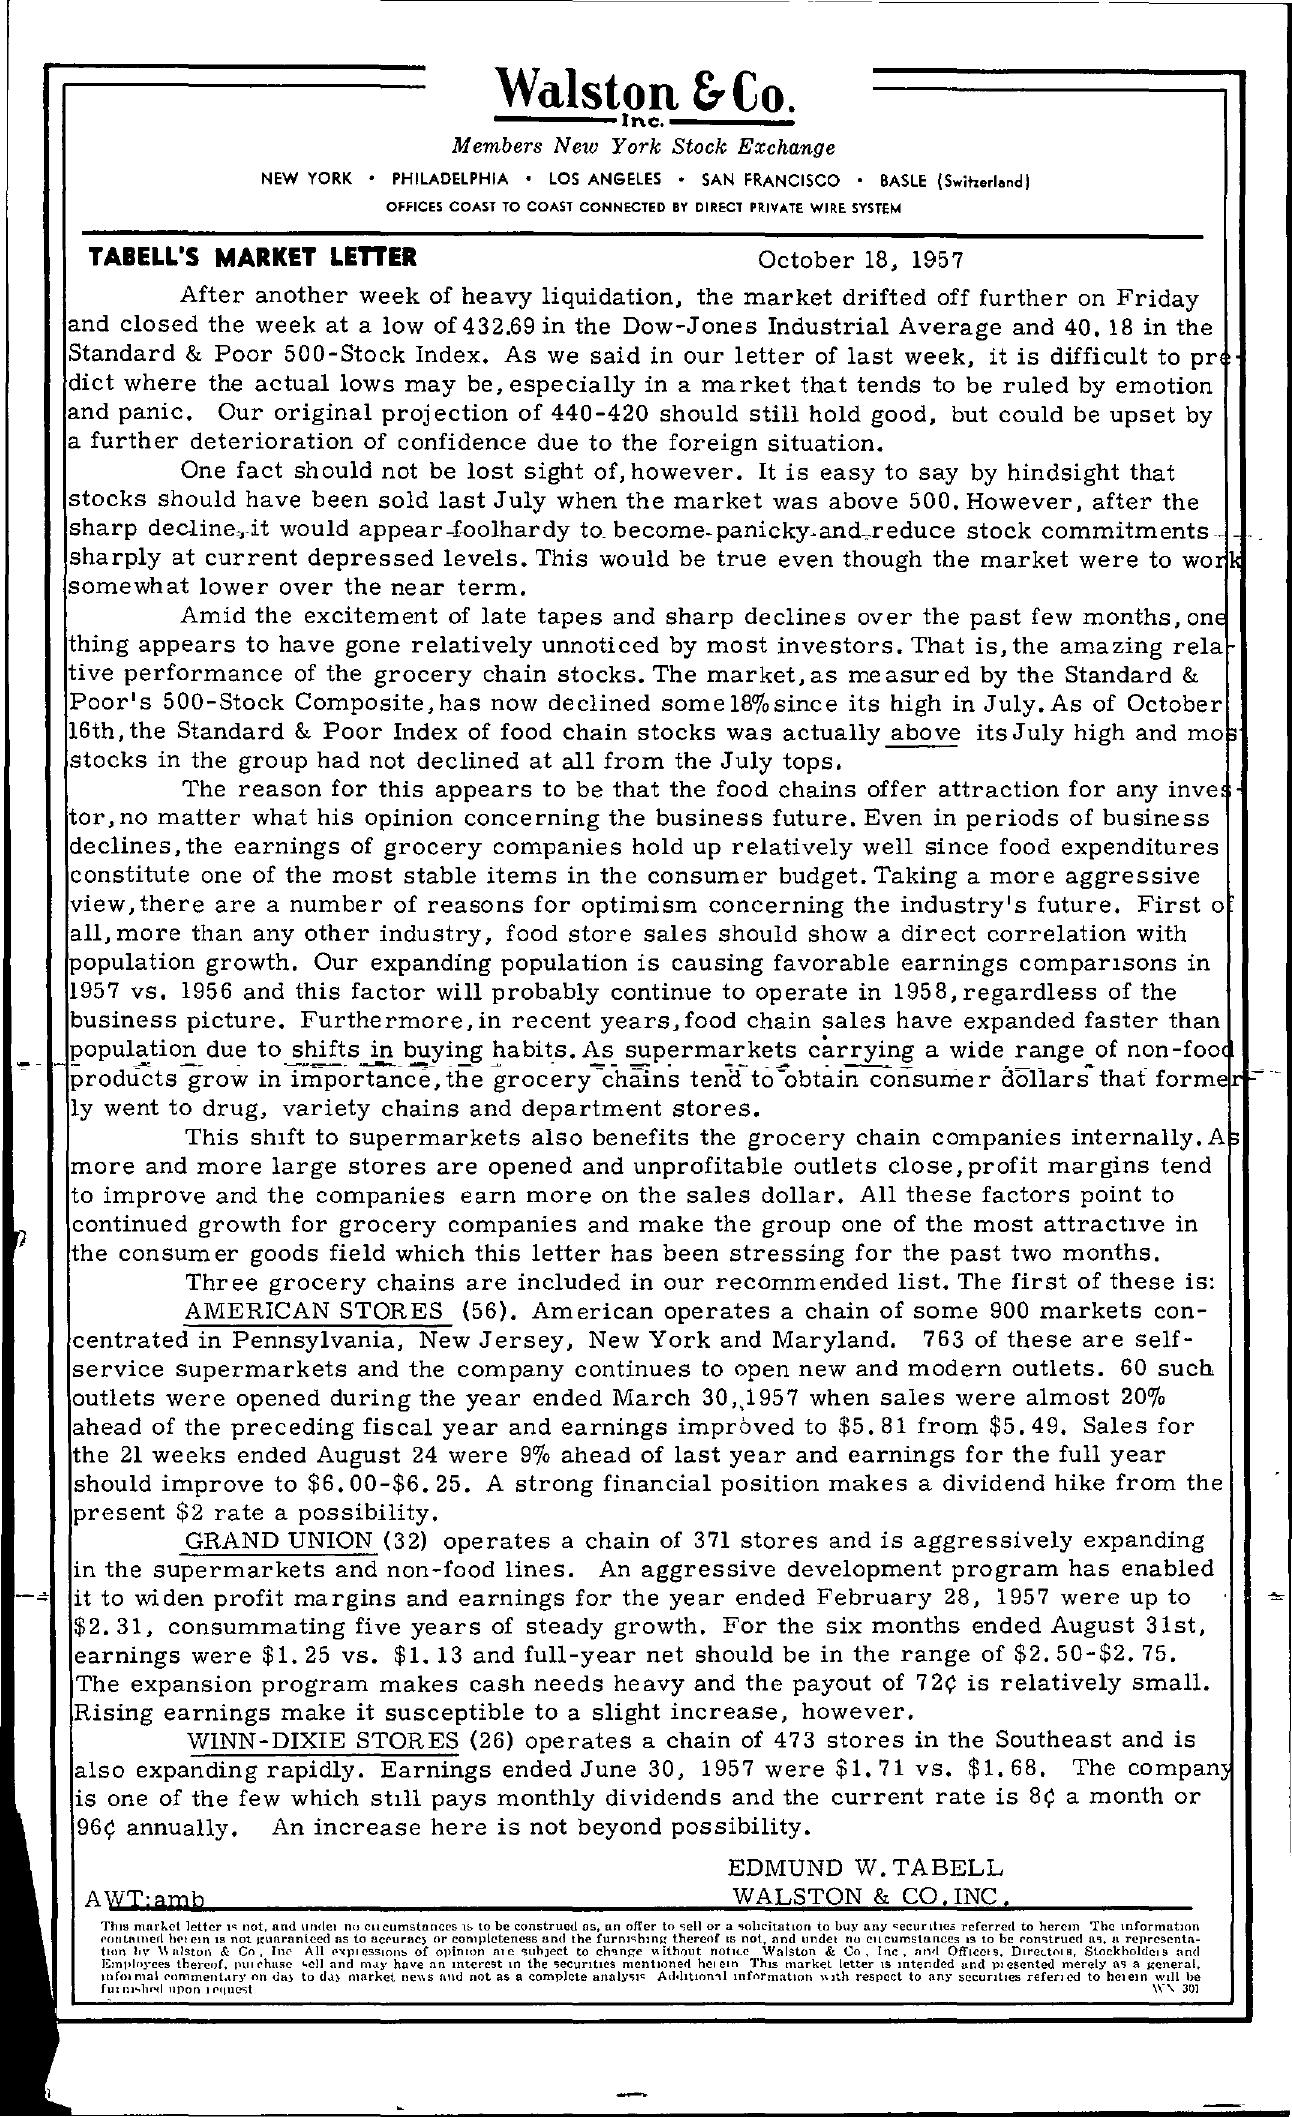 Tabell's Market Letter - October 18, 1957